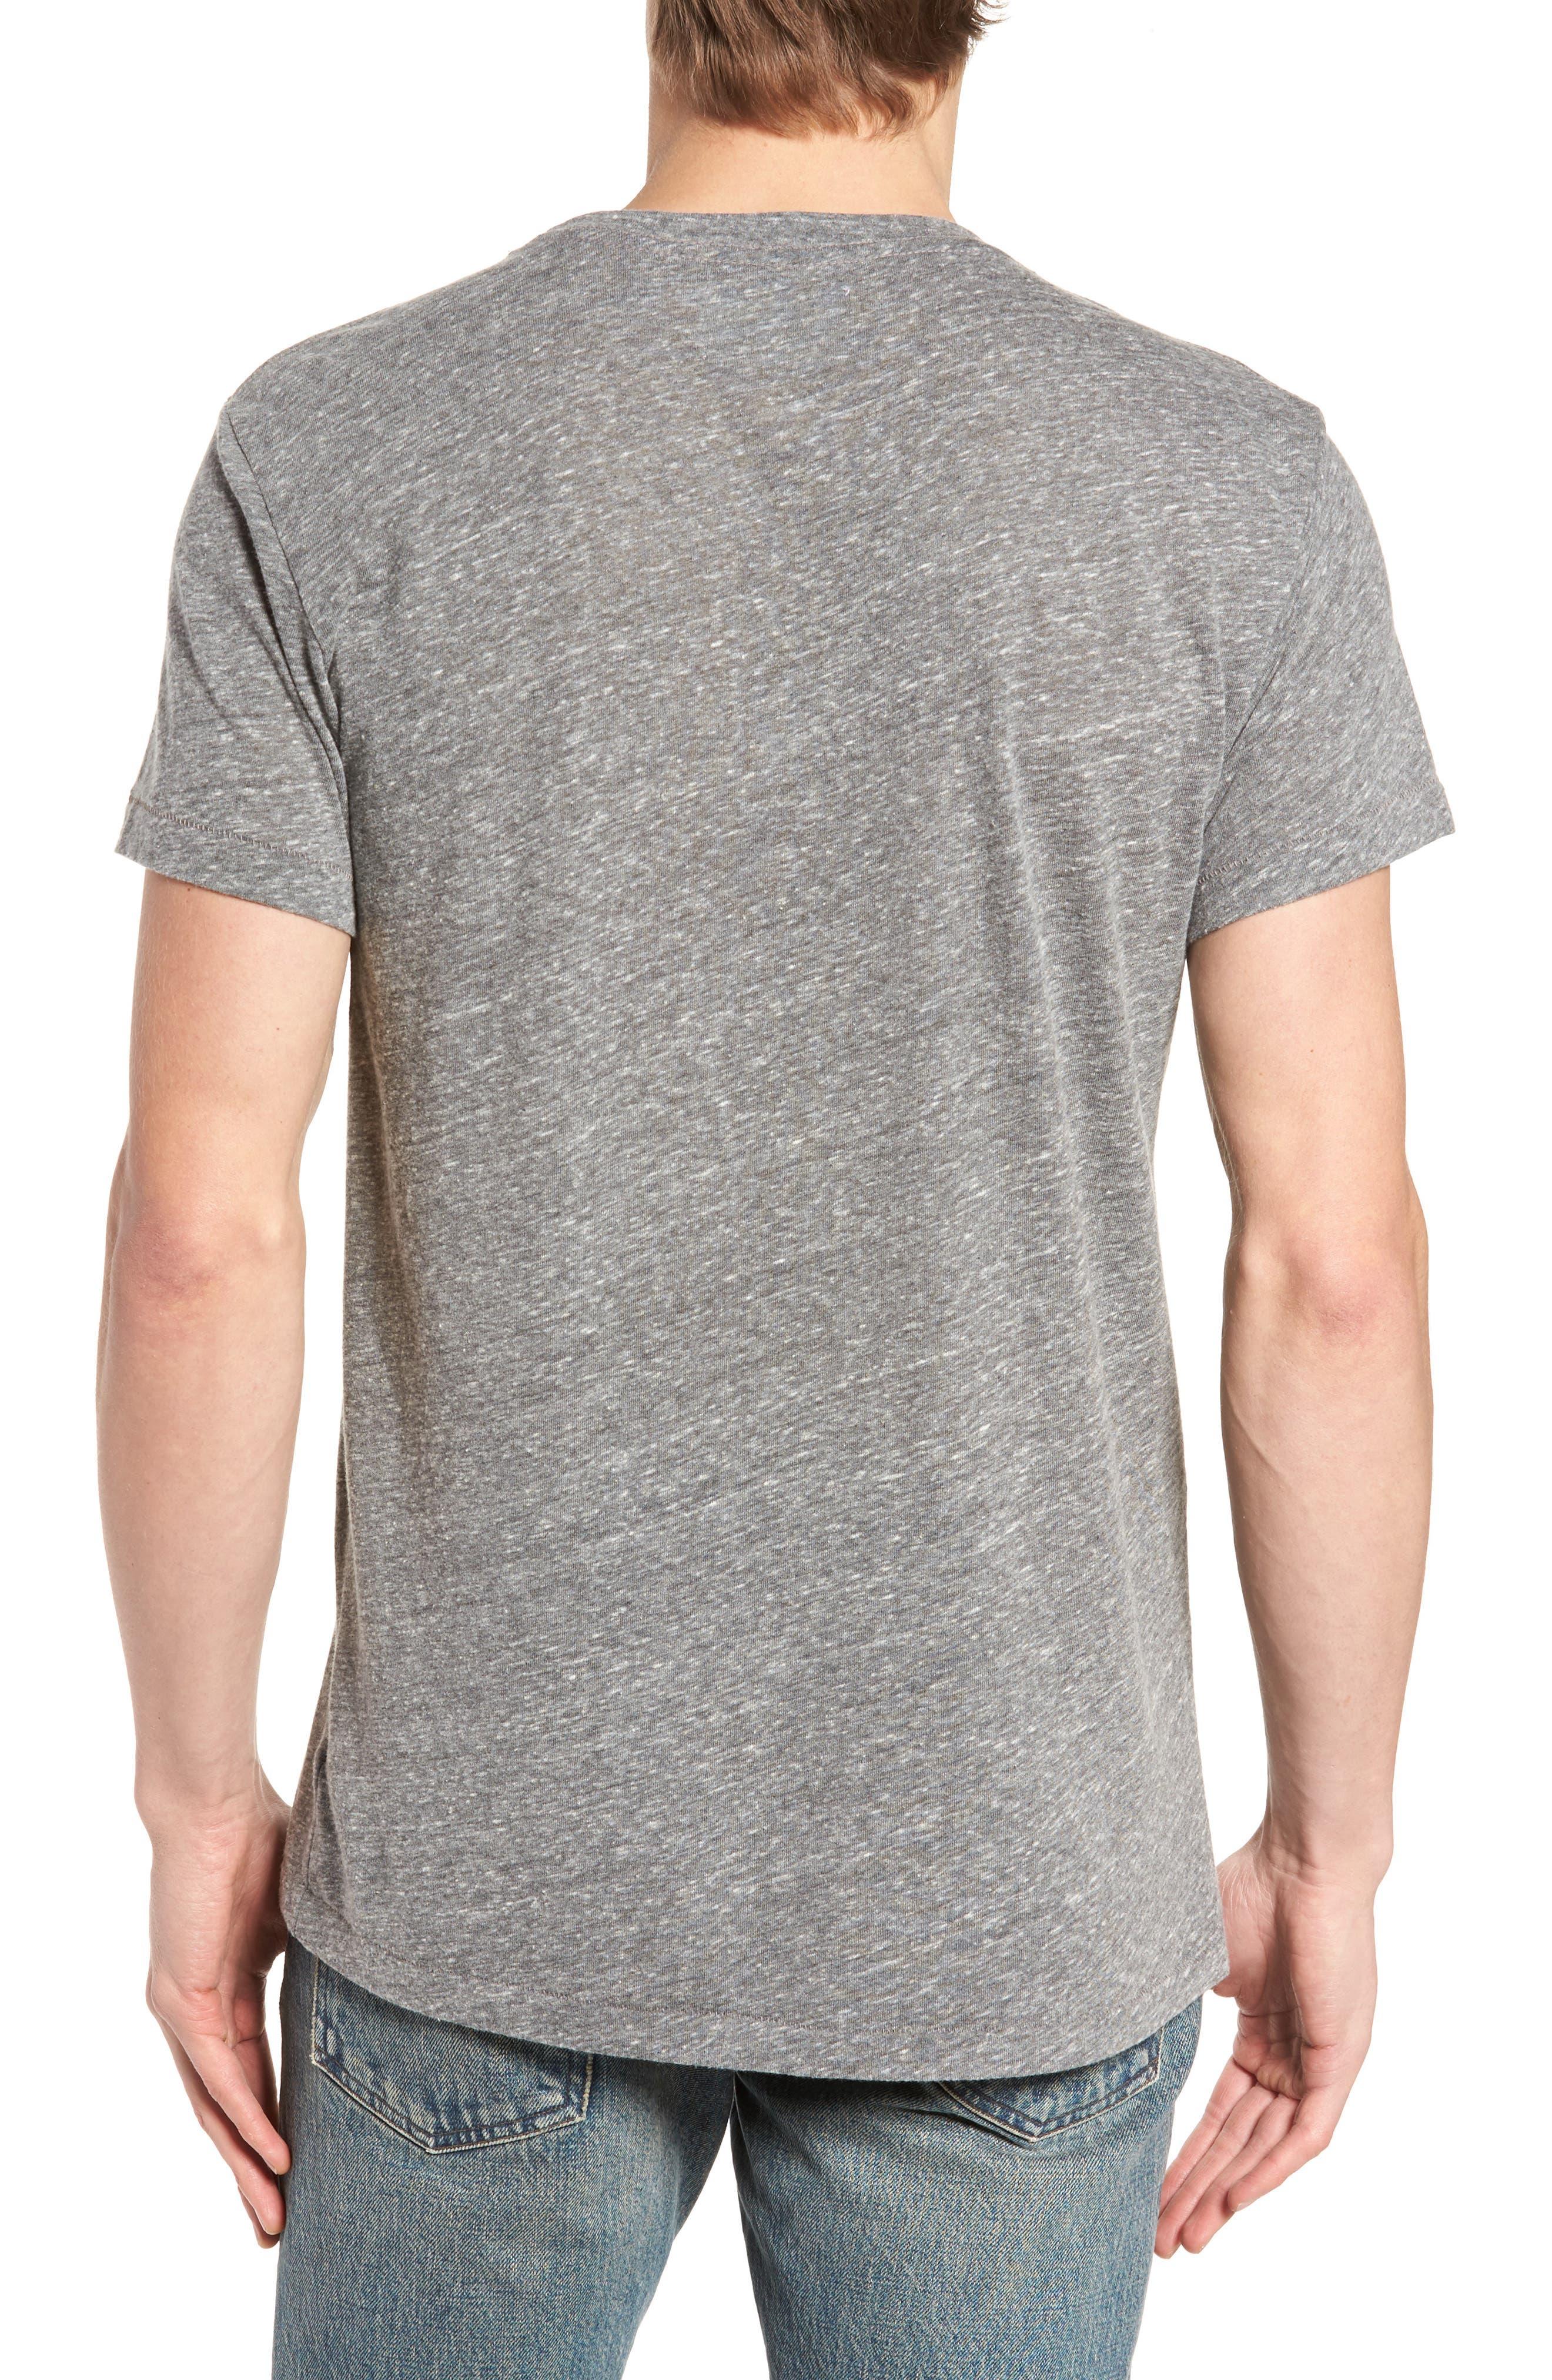 Las Palmas T-Shirt,                             Alternate thumbnail 2, color,                             Heather Grey